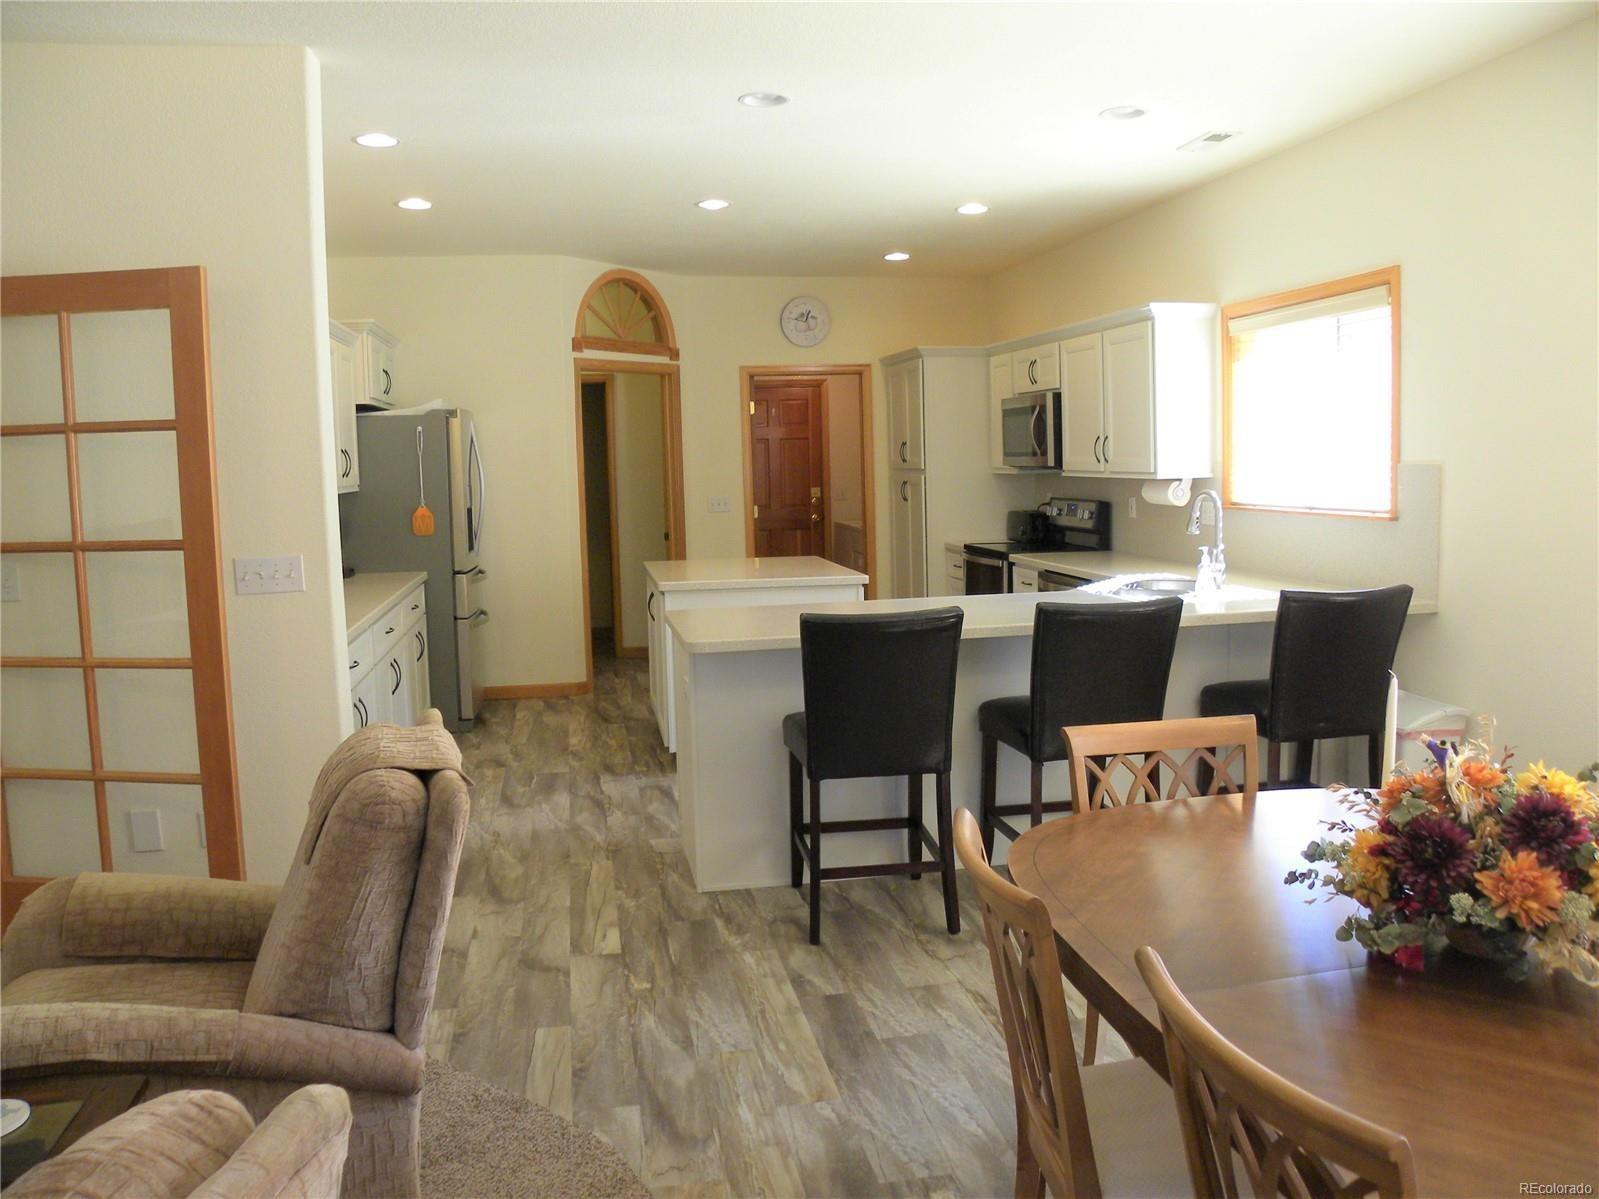 MLS# 5924977 - 6 - 1017 Cedarcrest Drive, Pueblo, CO 81005